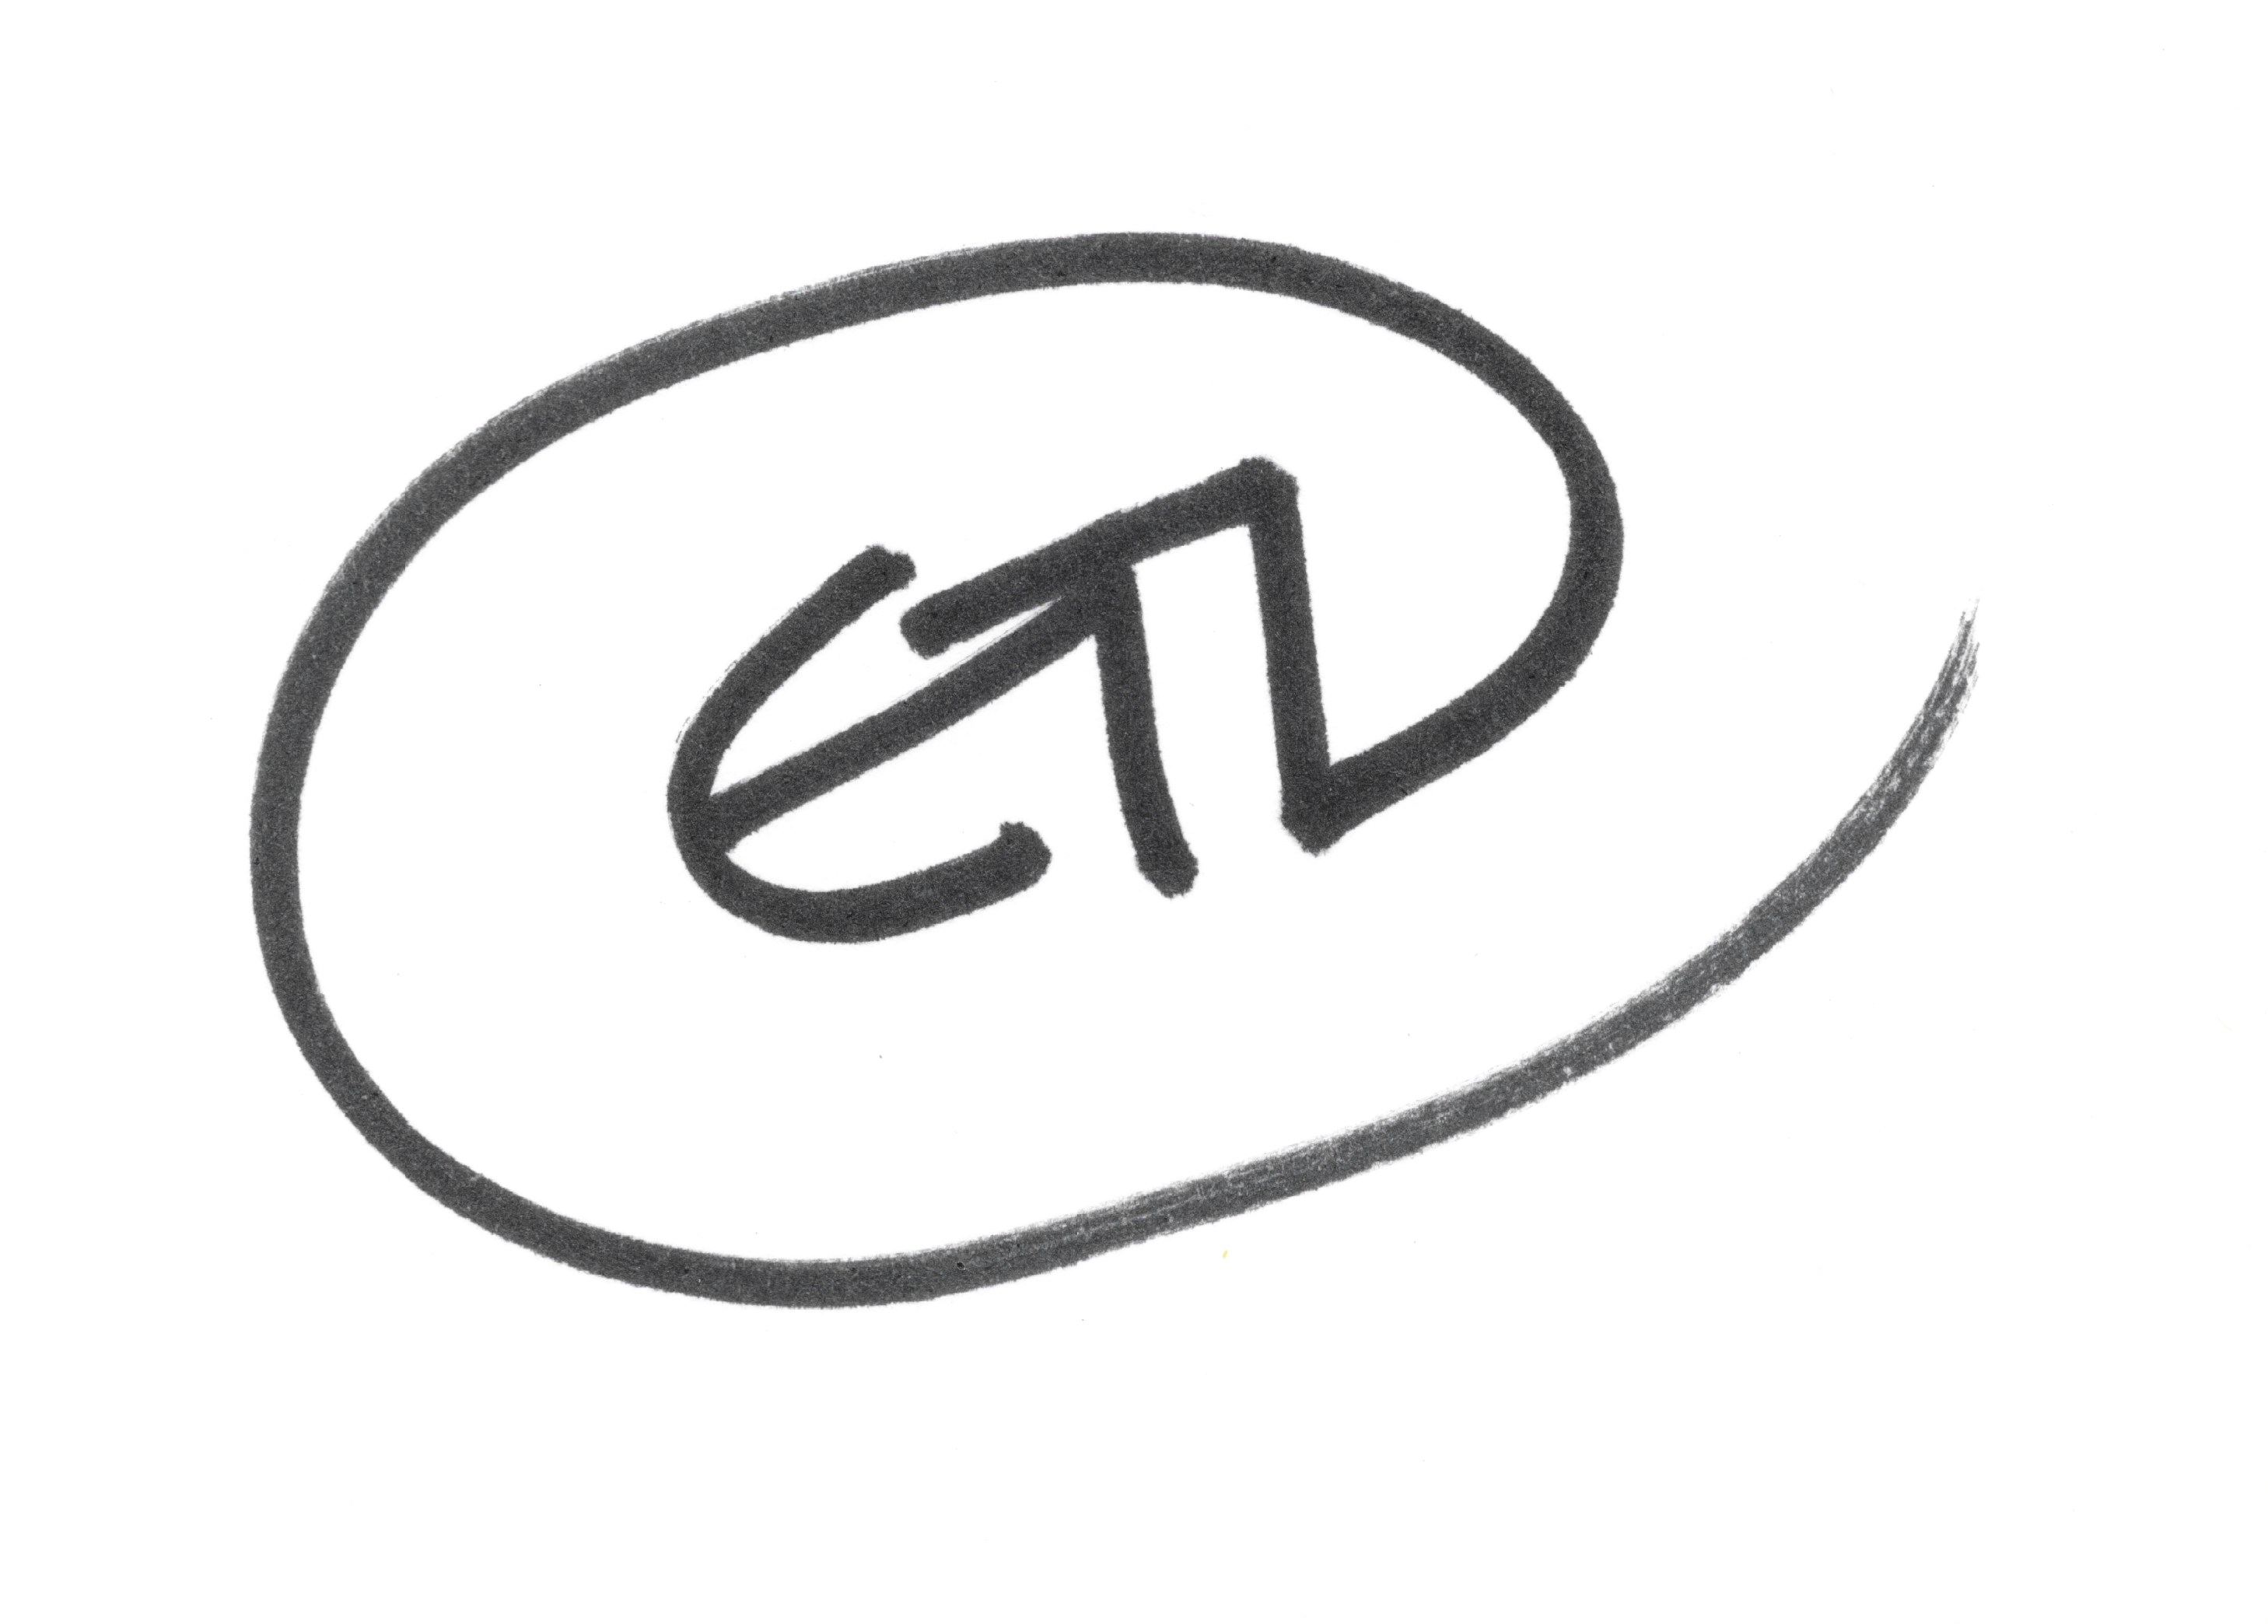 Elle Leonard's Signature